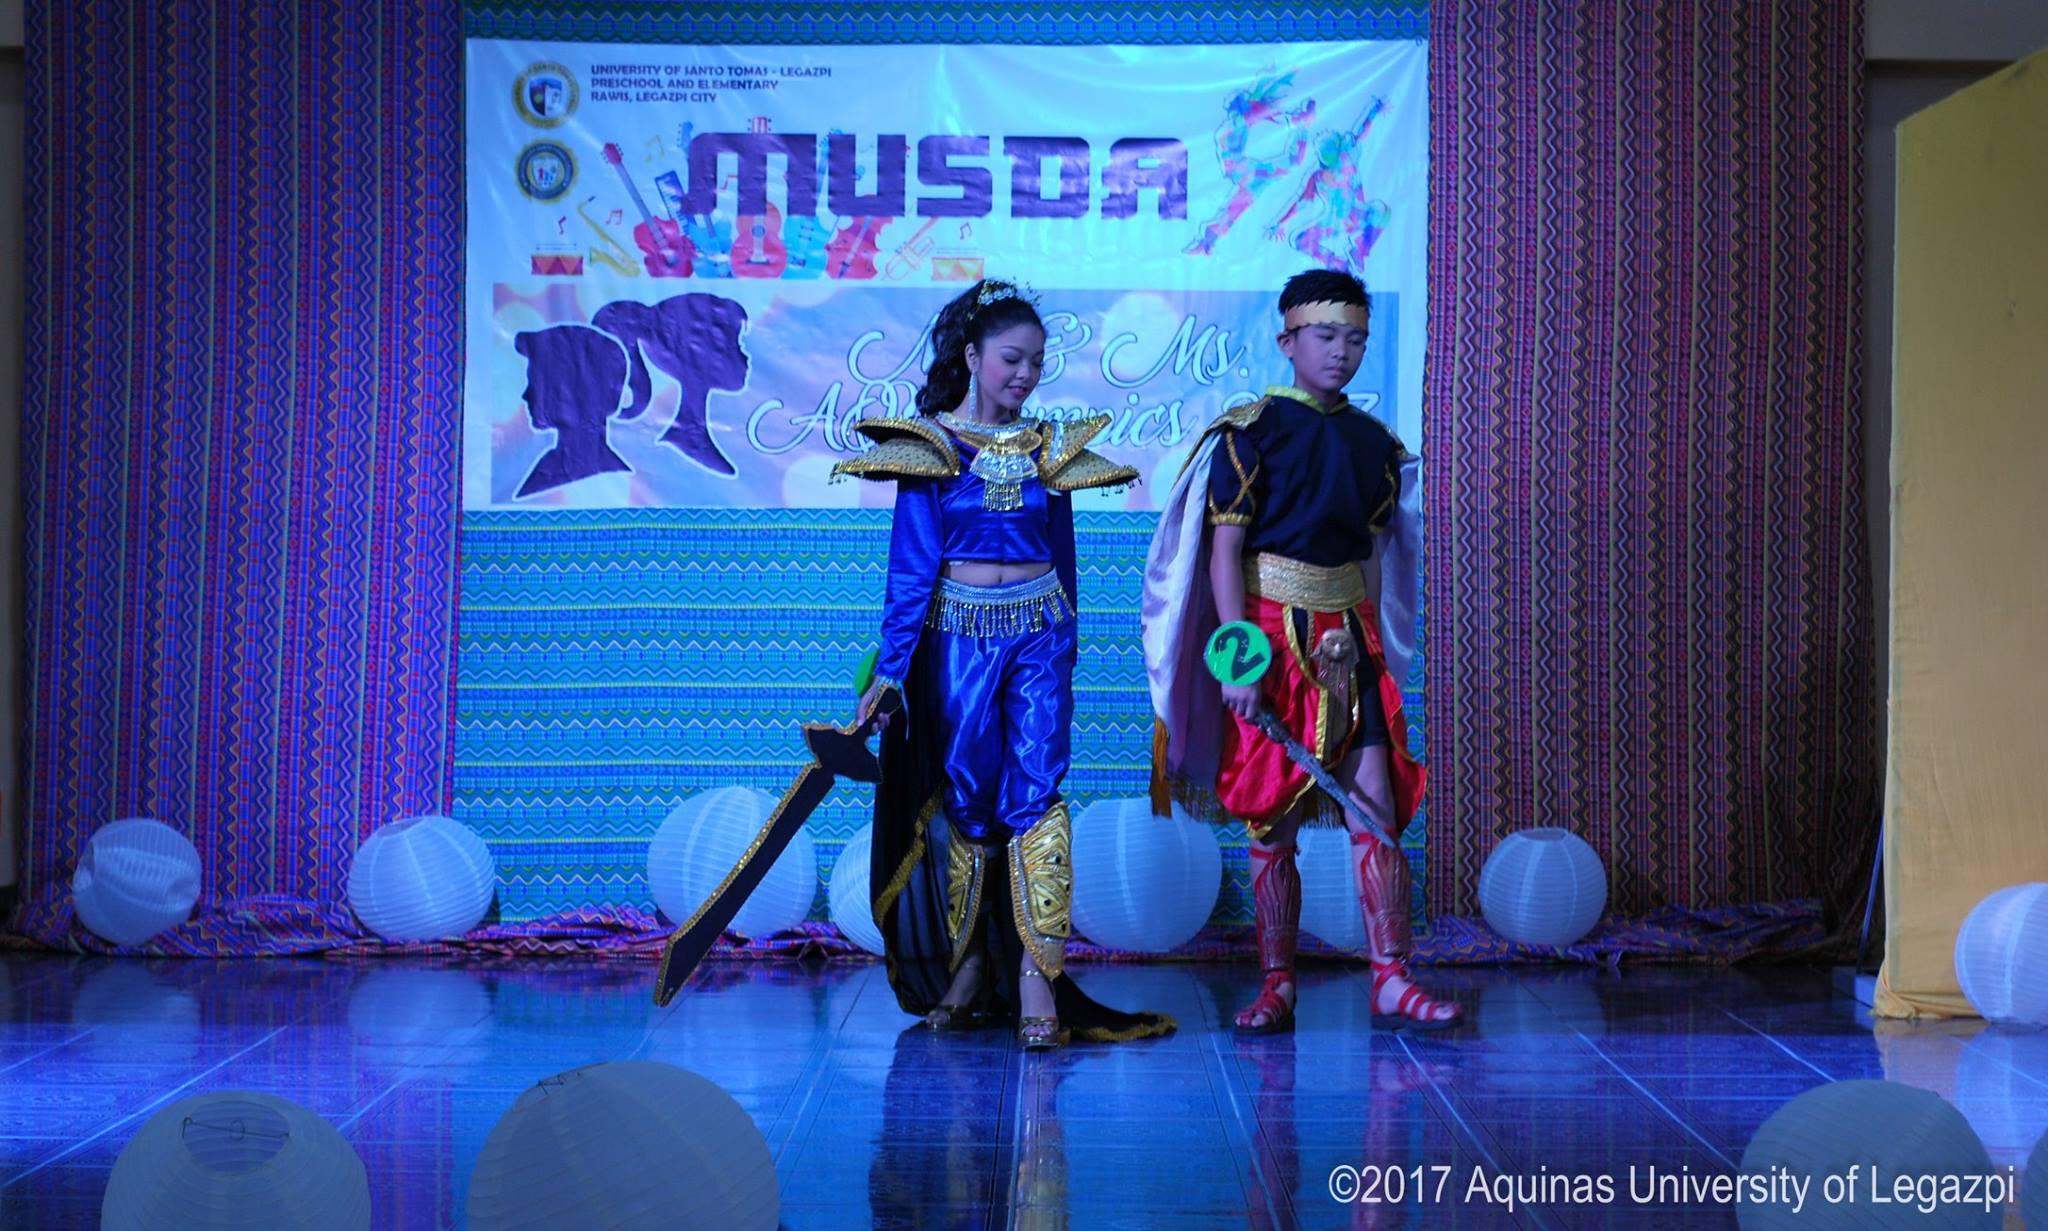 MUSDA and Mr. & Ms. Aquilympics 2017